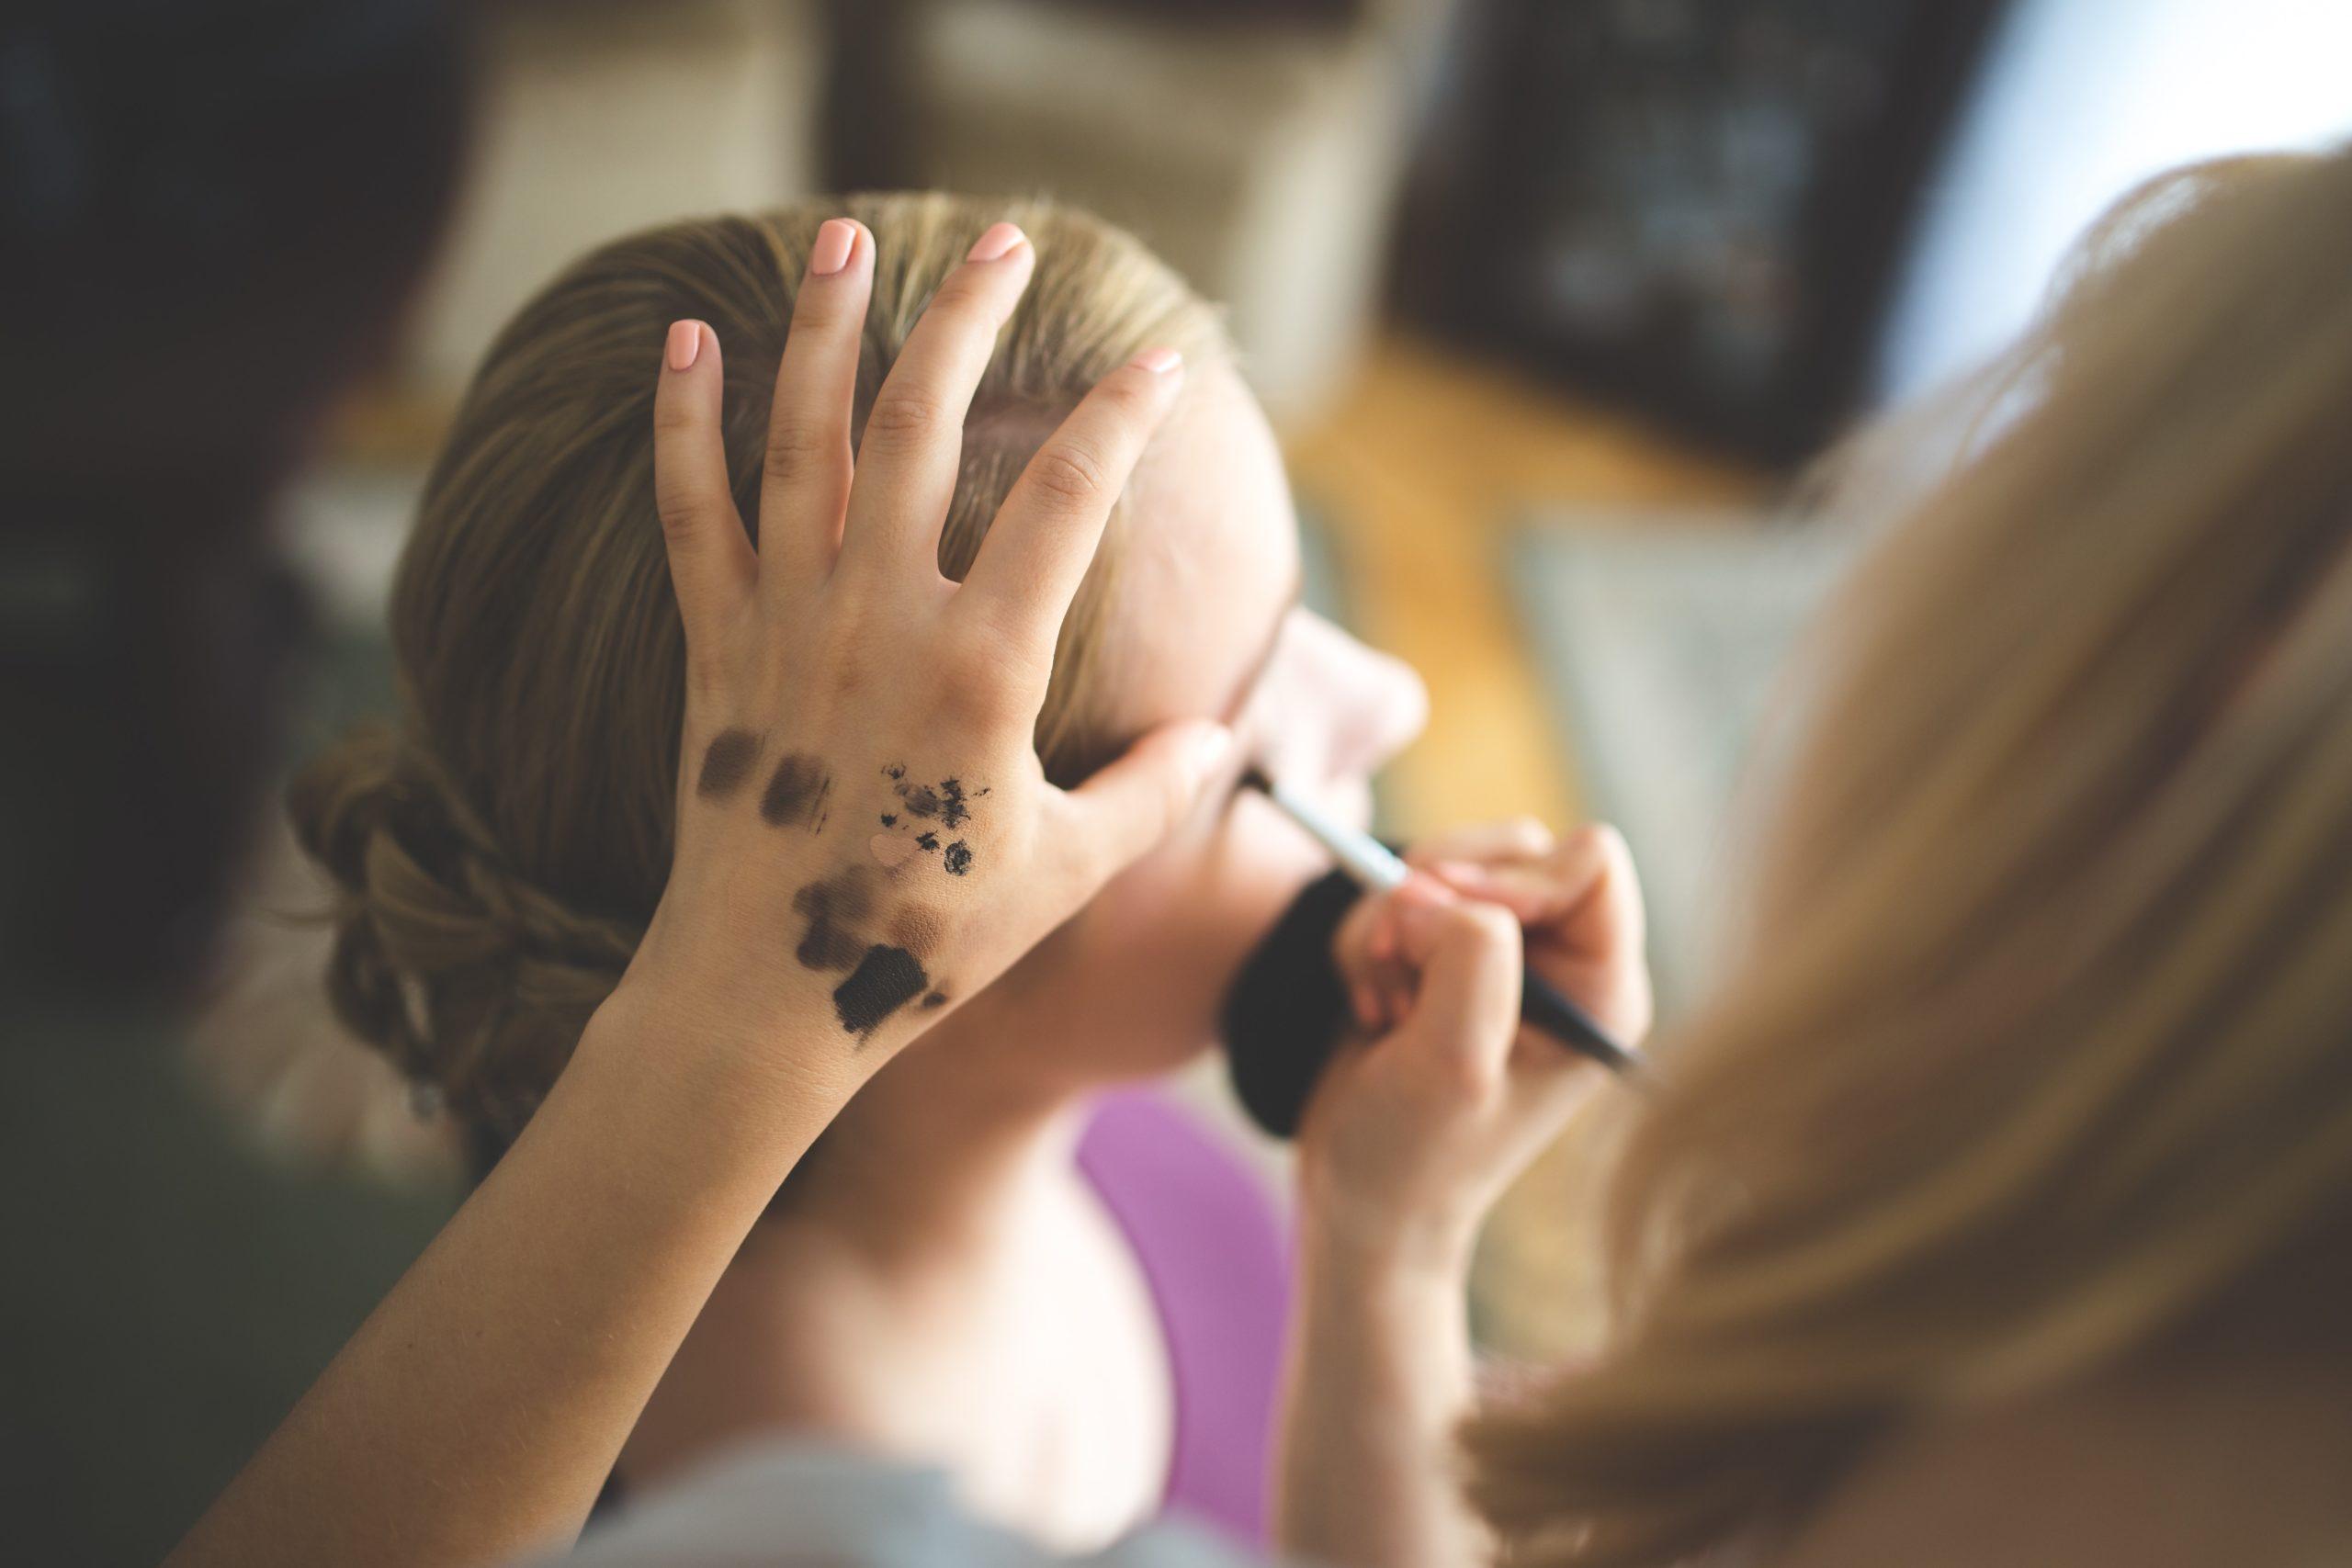 Photo of Happy Makeup Artist applying makeup Windsor Toronto Ontario Canada